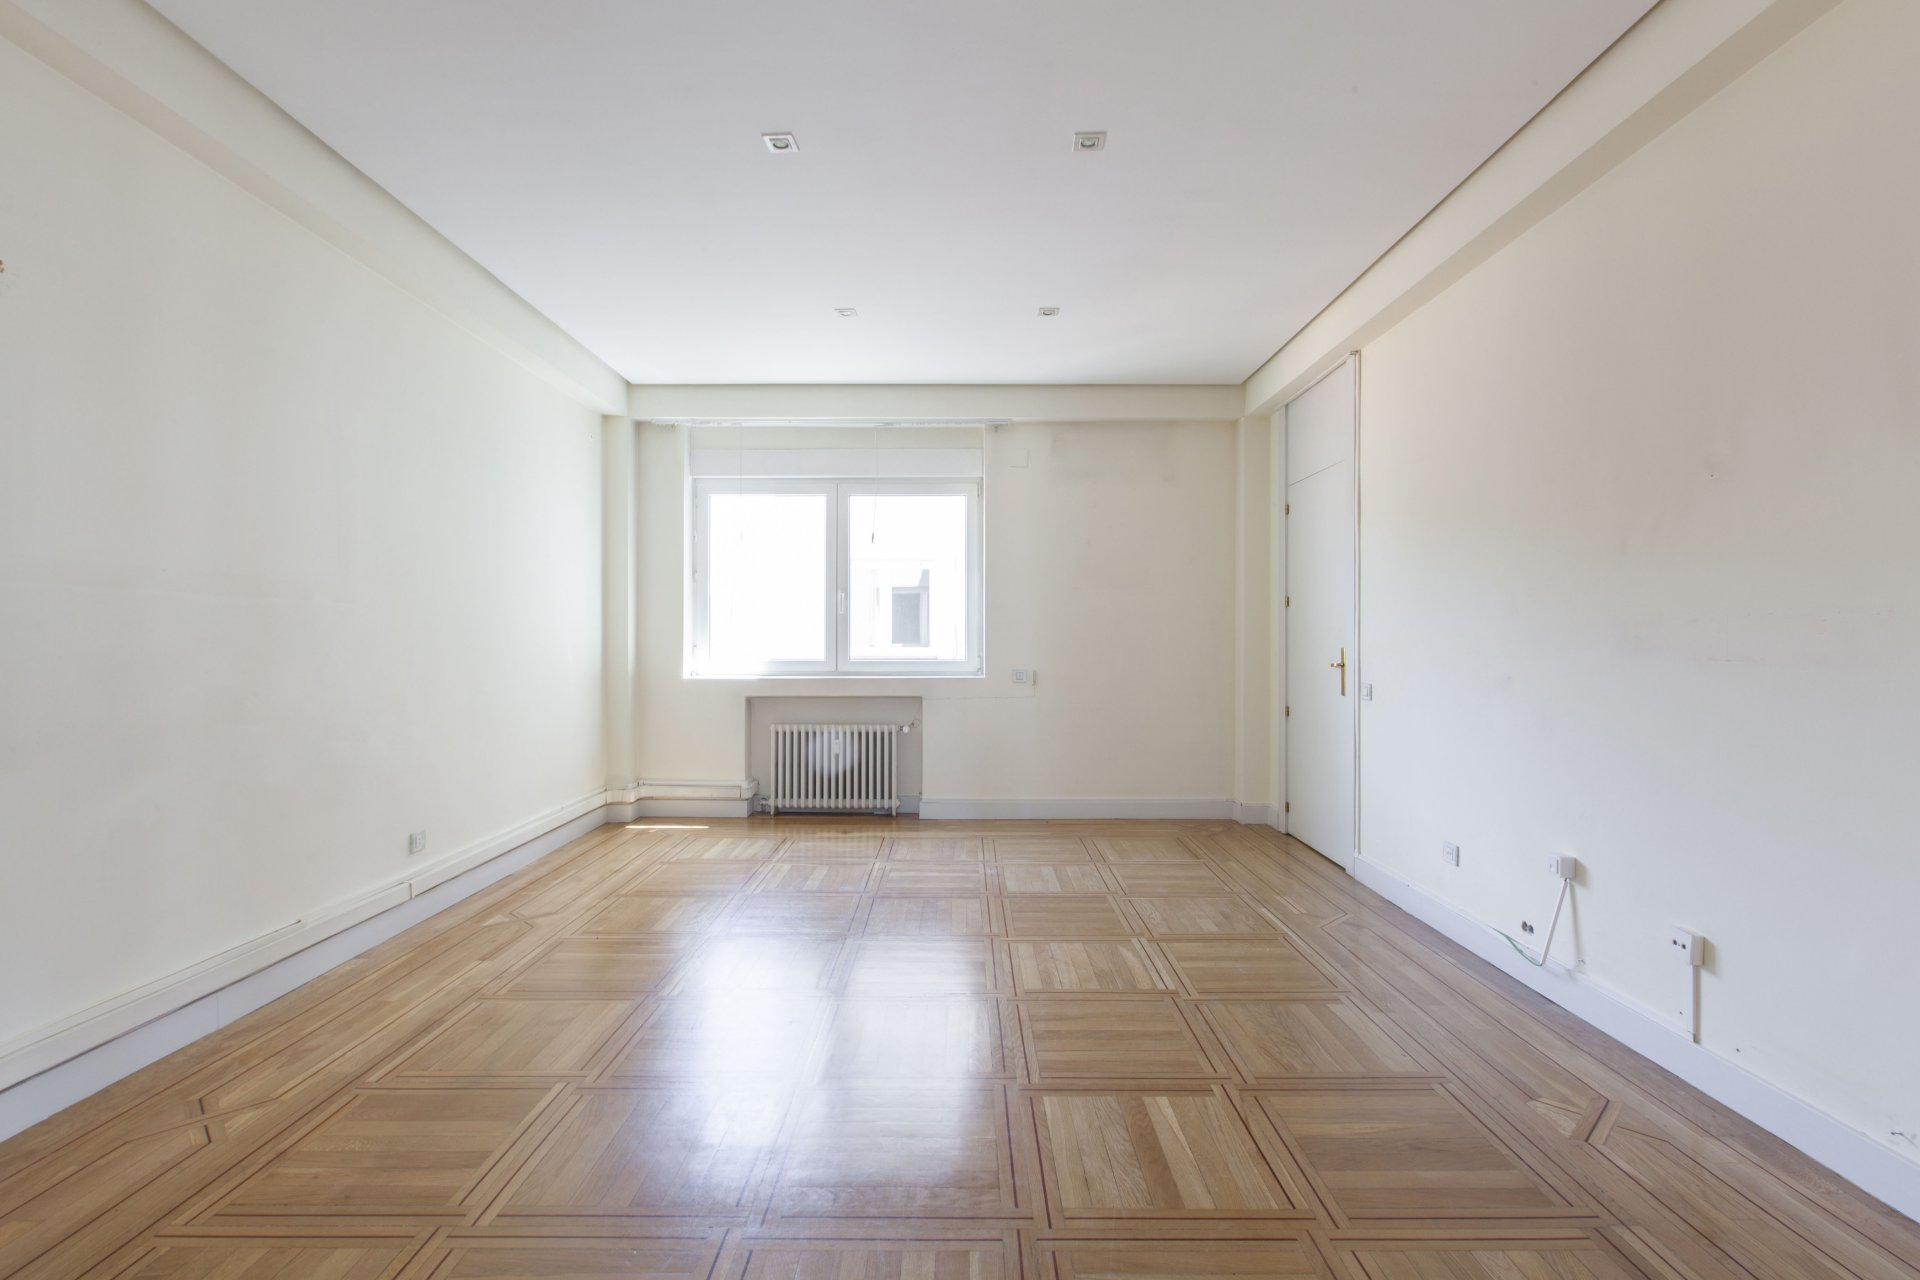 Anuncio alquiler piso madrid recoletos 28001 john taylor - Alquiler piso amorebieta ...